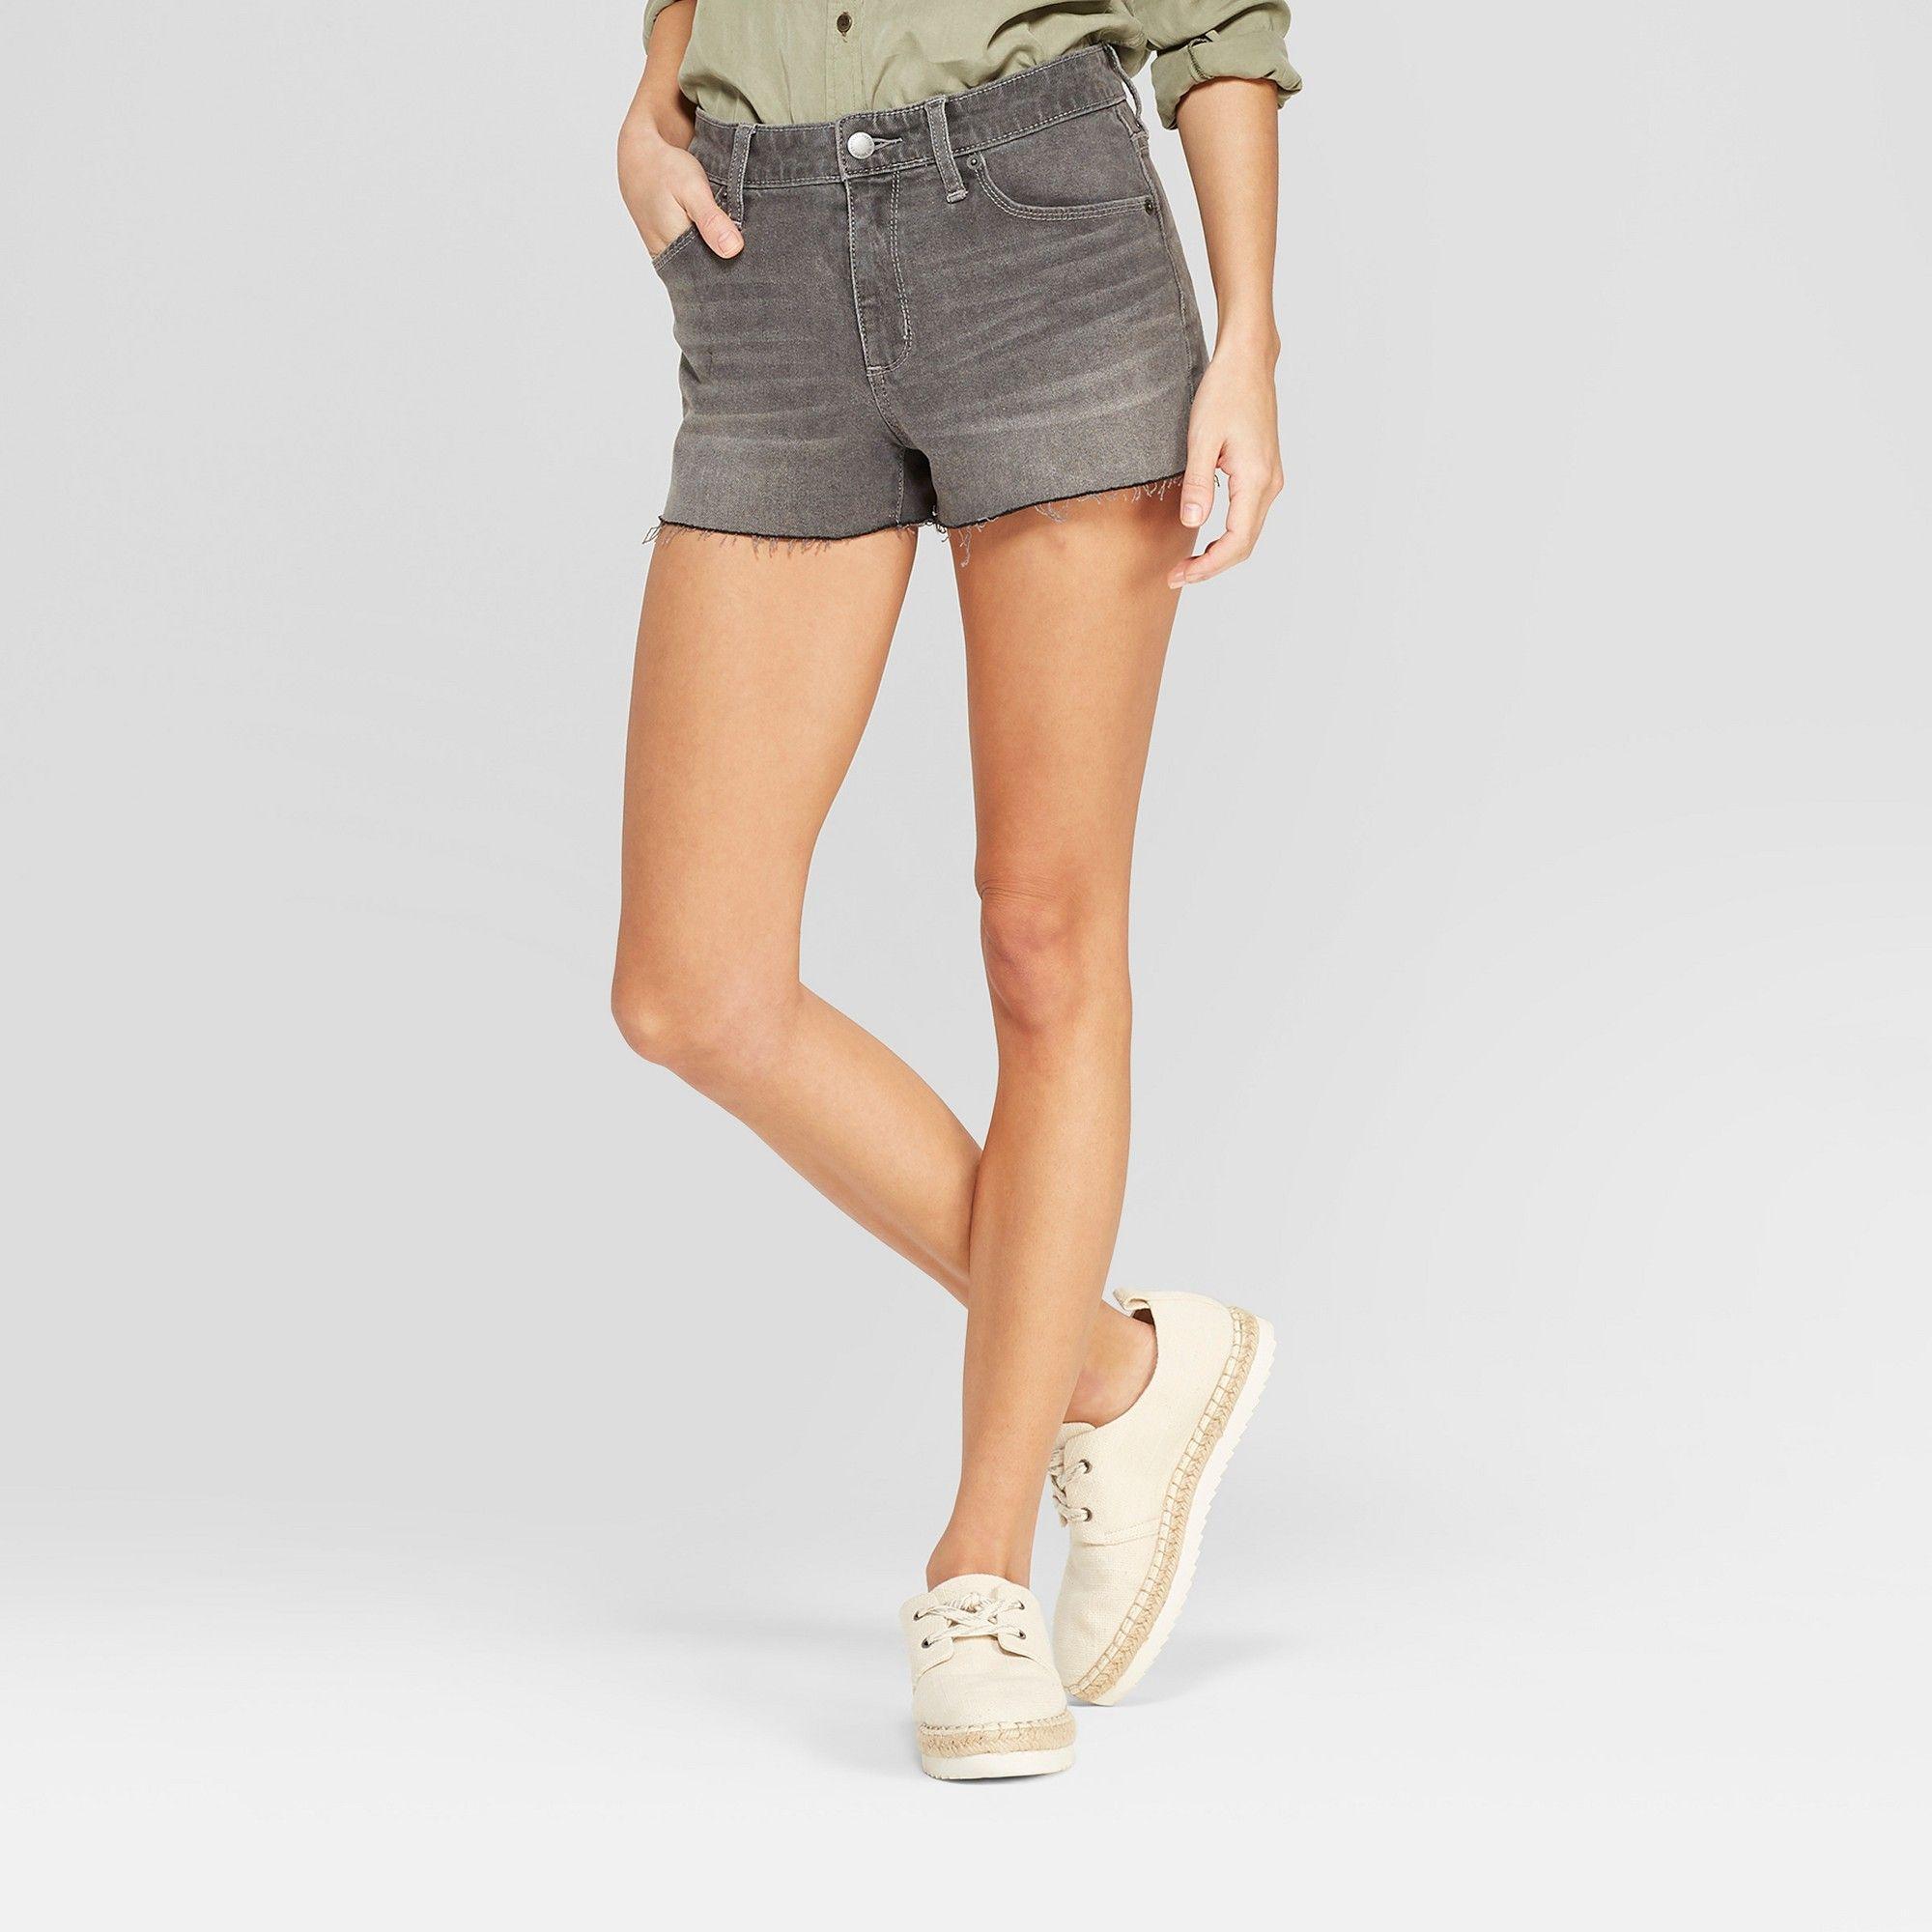 b9e833a7ac Women's High-Rise Jean Shorts - Universal Thread Gray Wash 16 in ...